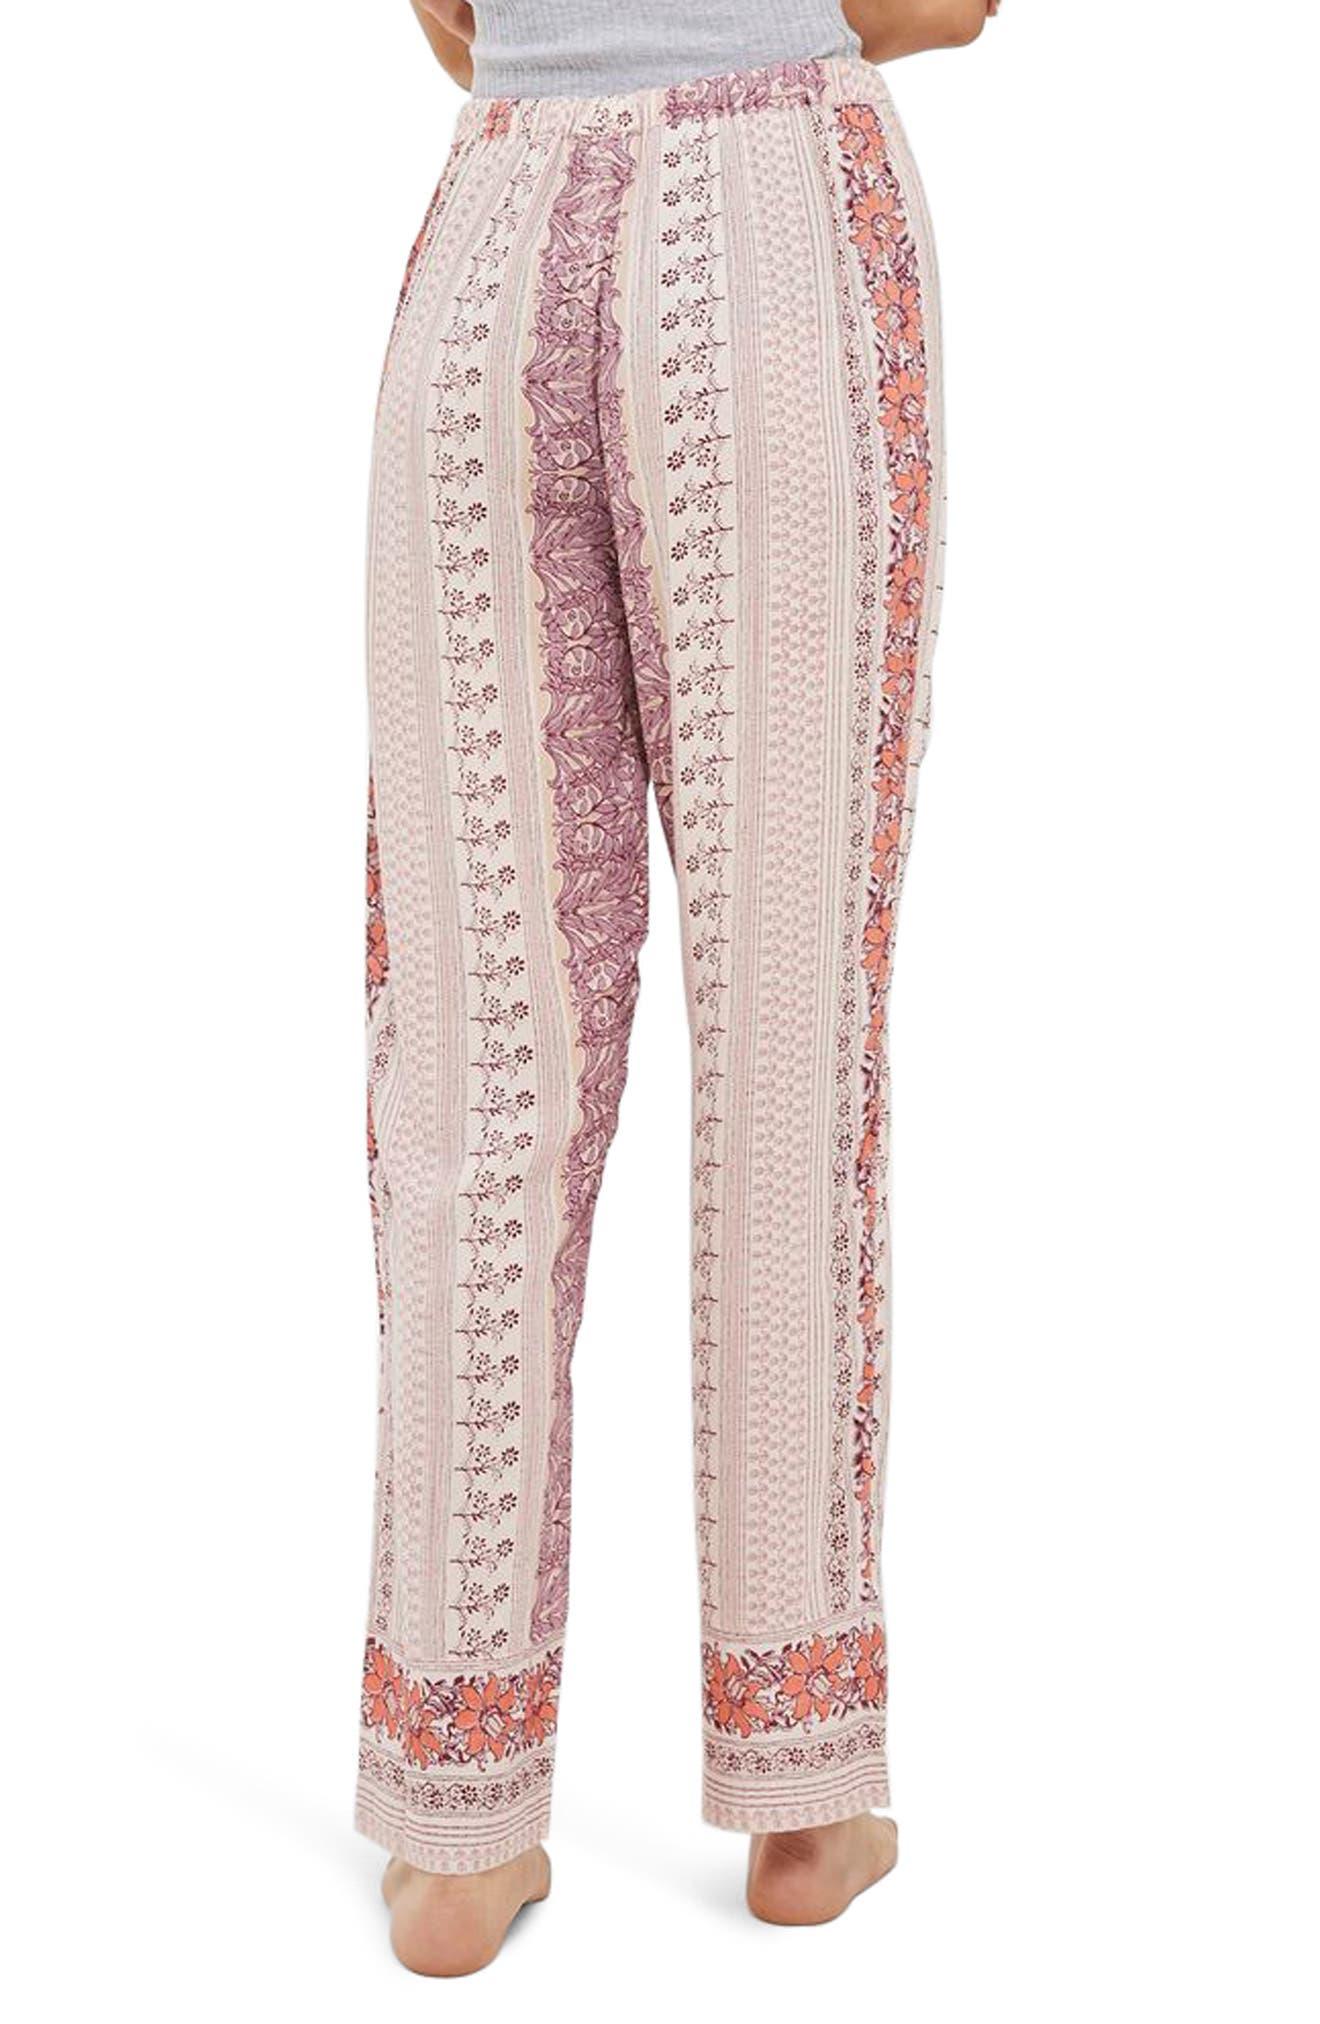 Bohemian Floral Print Pajama Pants,                             Alternate thumbnail 2, color,                             530